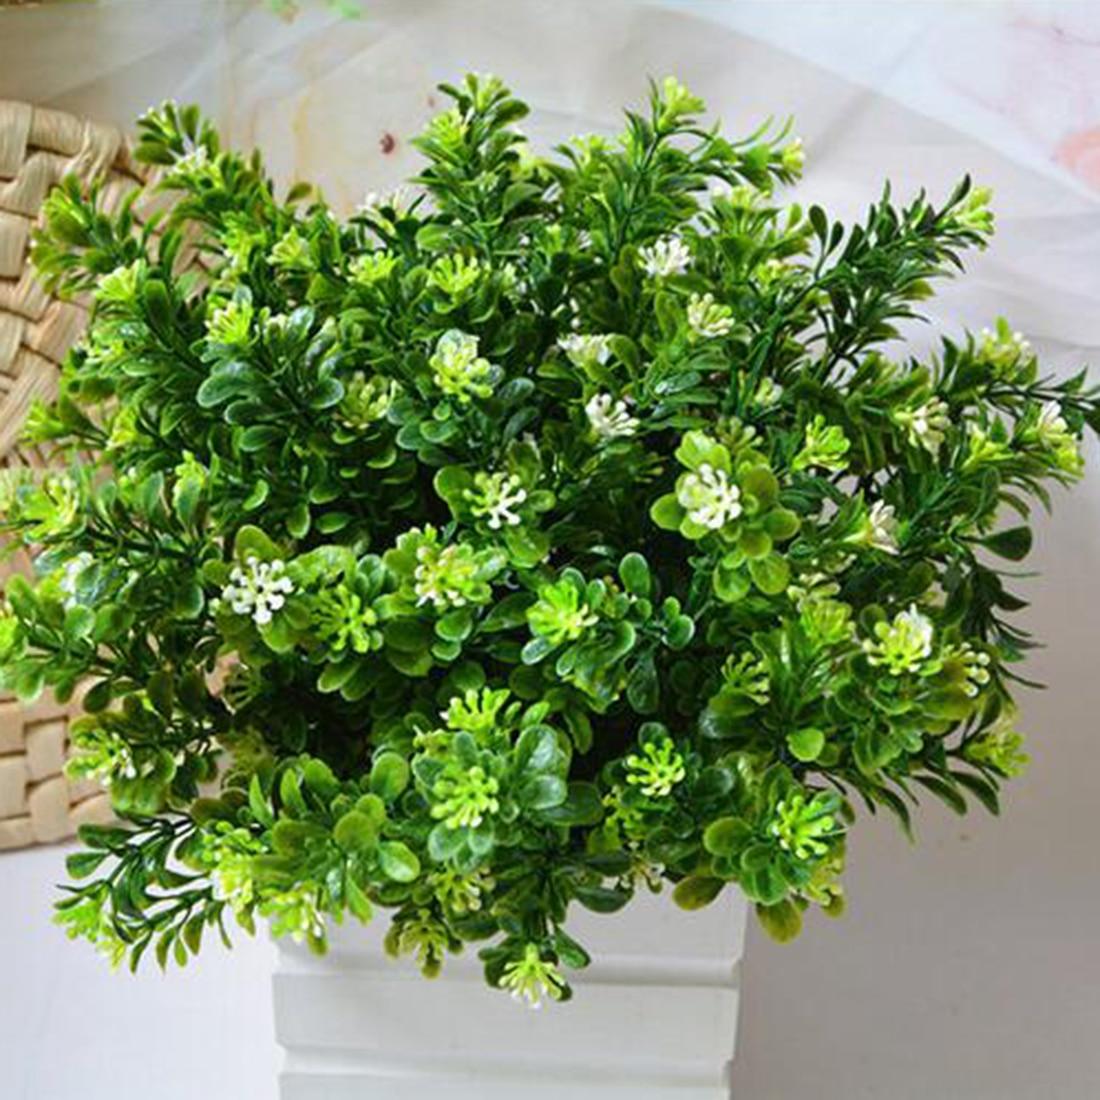 2018 7 Branch/Bouquet 35 Heads Artificial Green Plant Fake Milan Grass Bonsai Decoration Leaf Corner Lawn Decoration